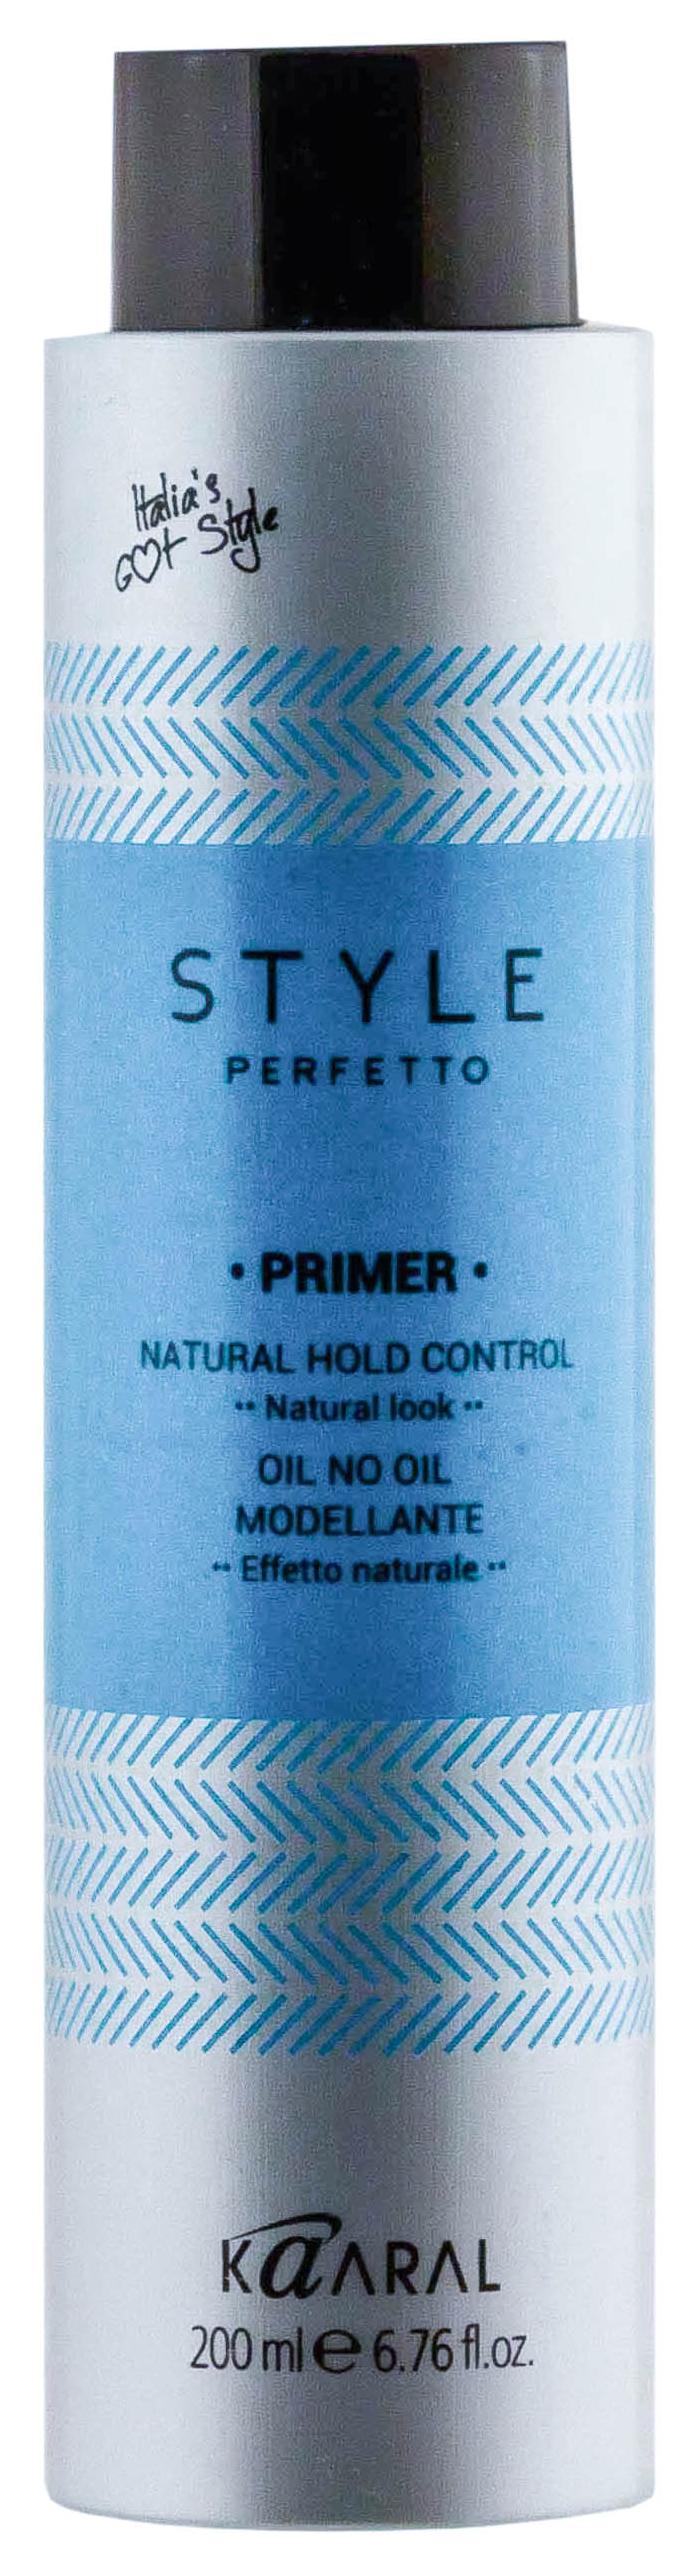 Купить Масло для волос Kaaral Style Perfetto Primer Natural Hold Control 200 мл